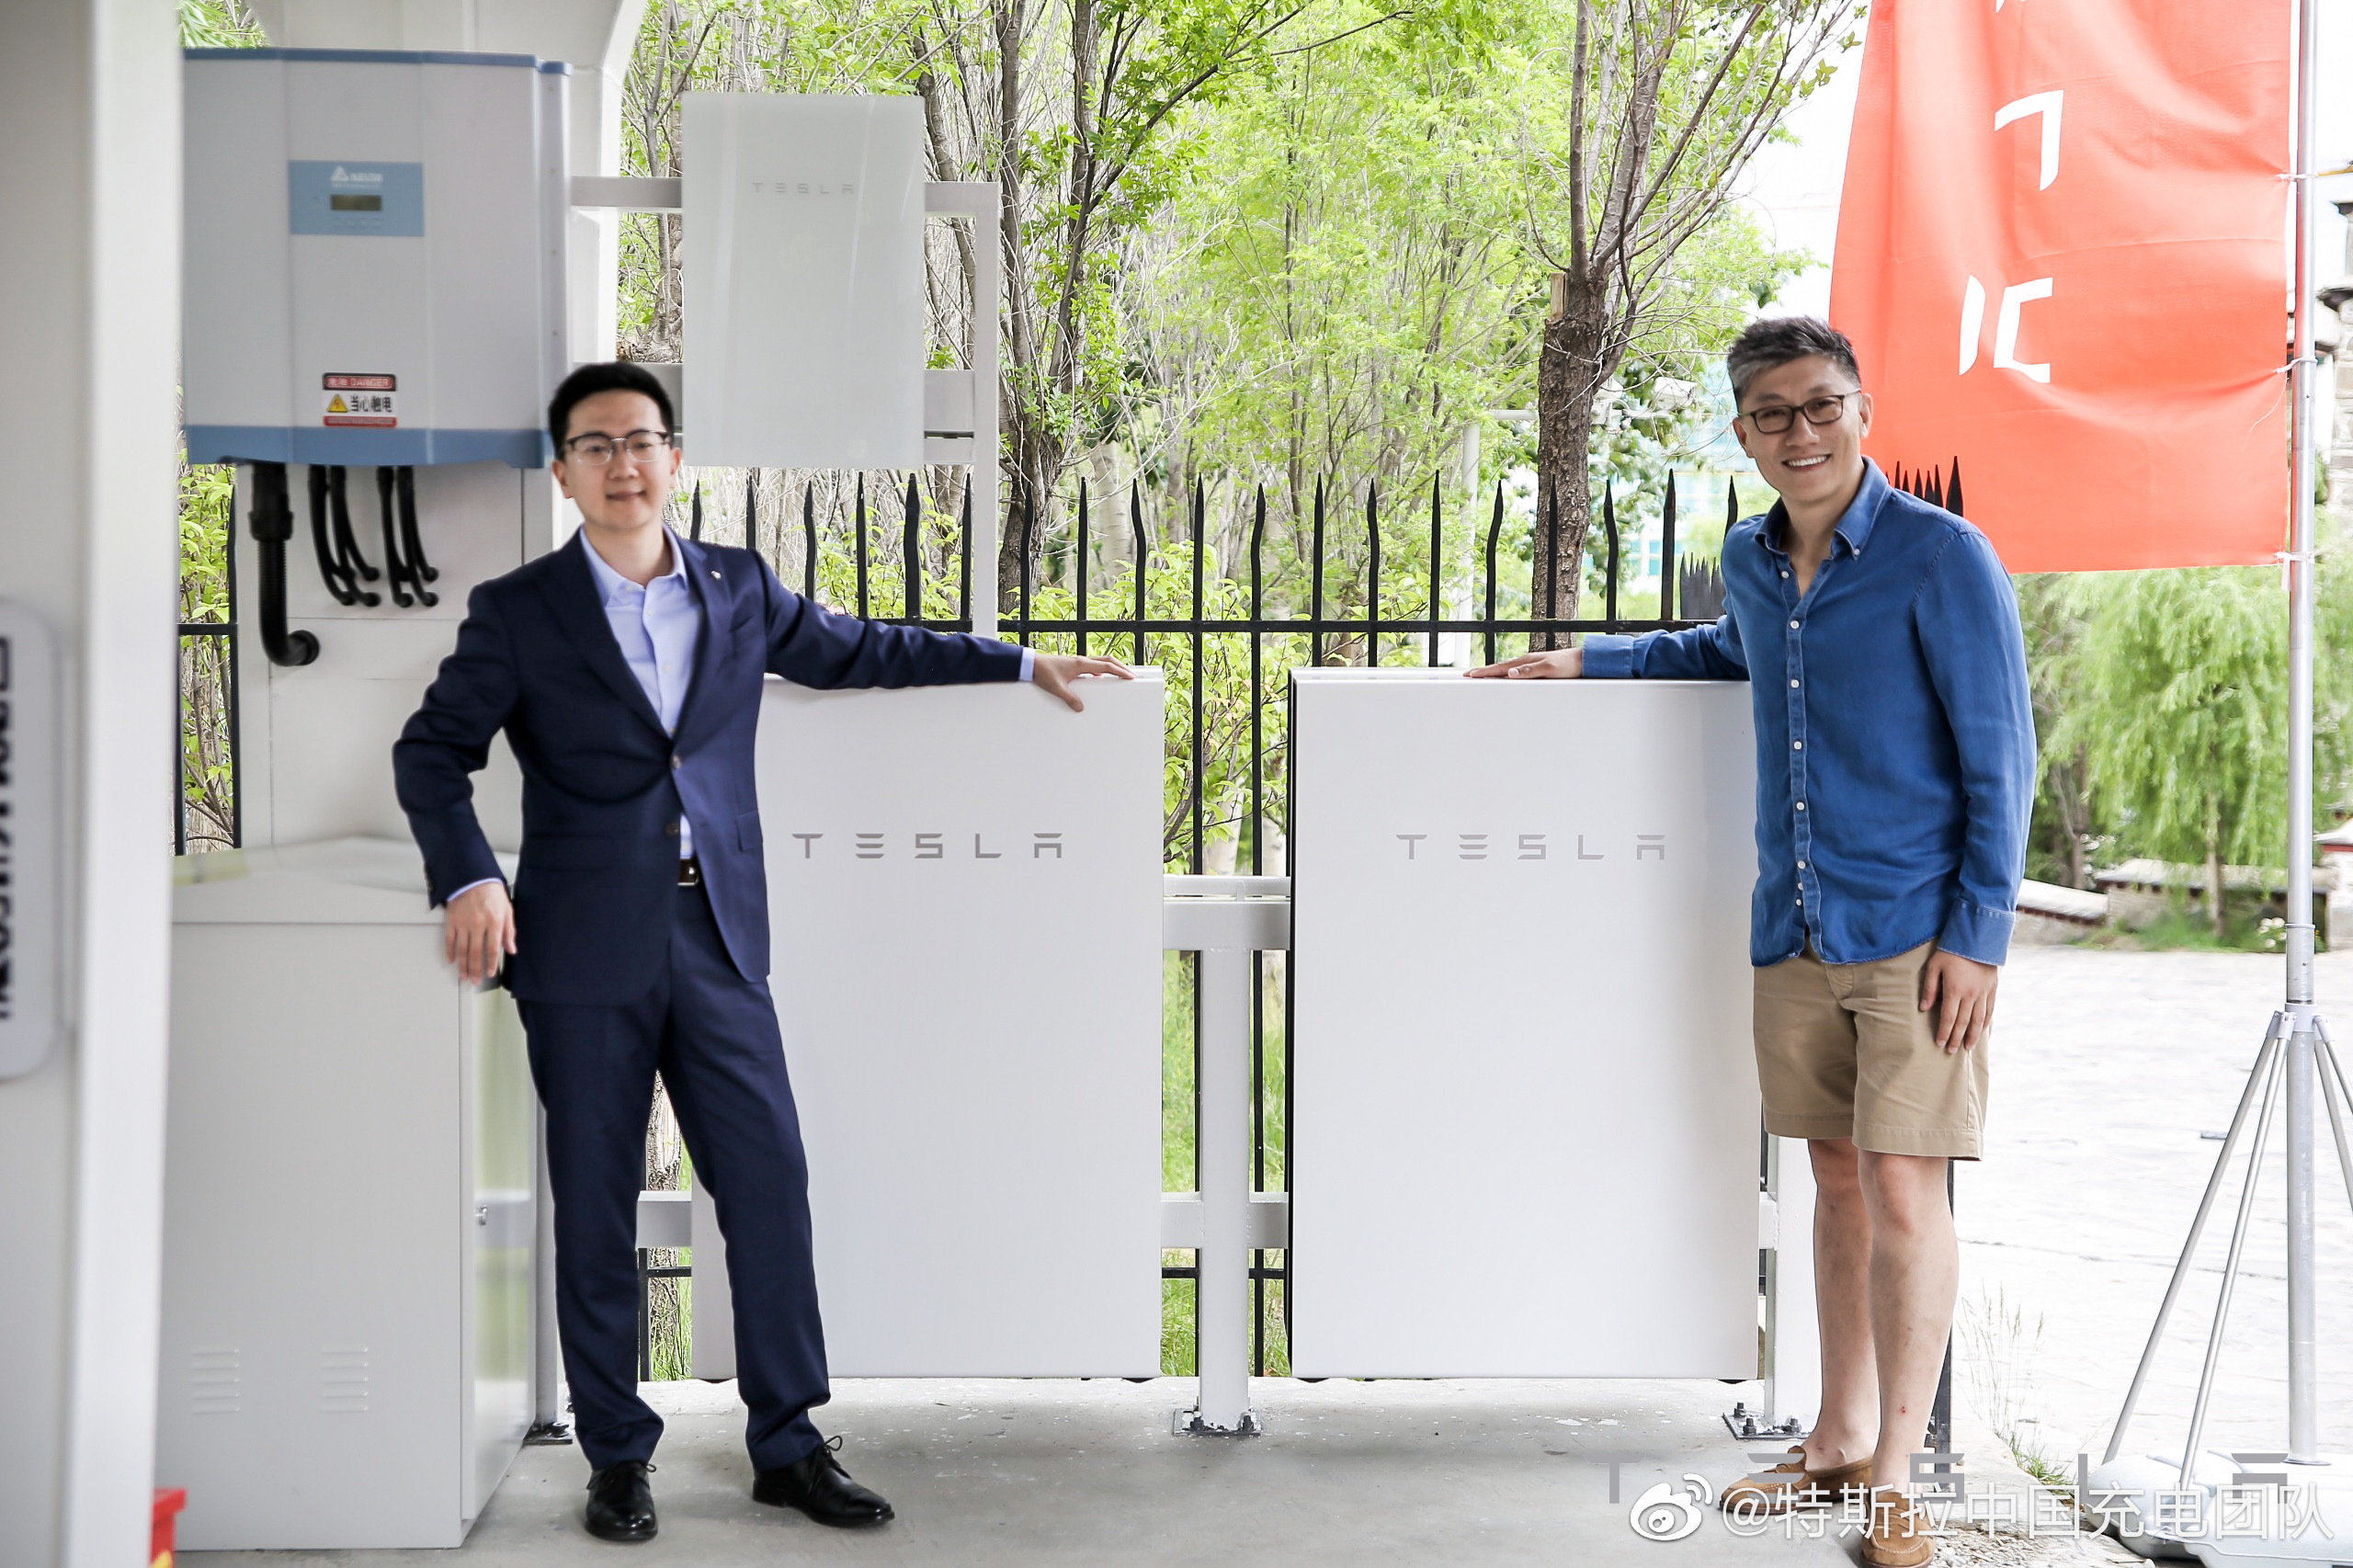 tesla-solar-supercharger-lhasa-powerwall